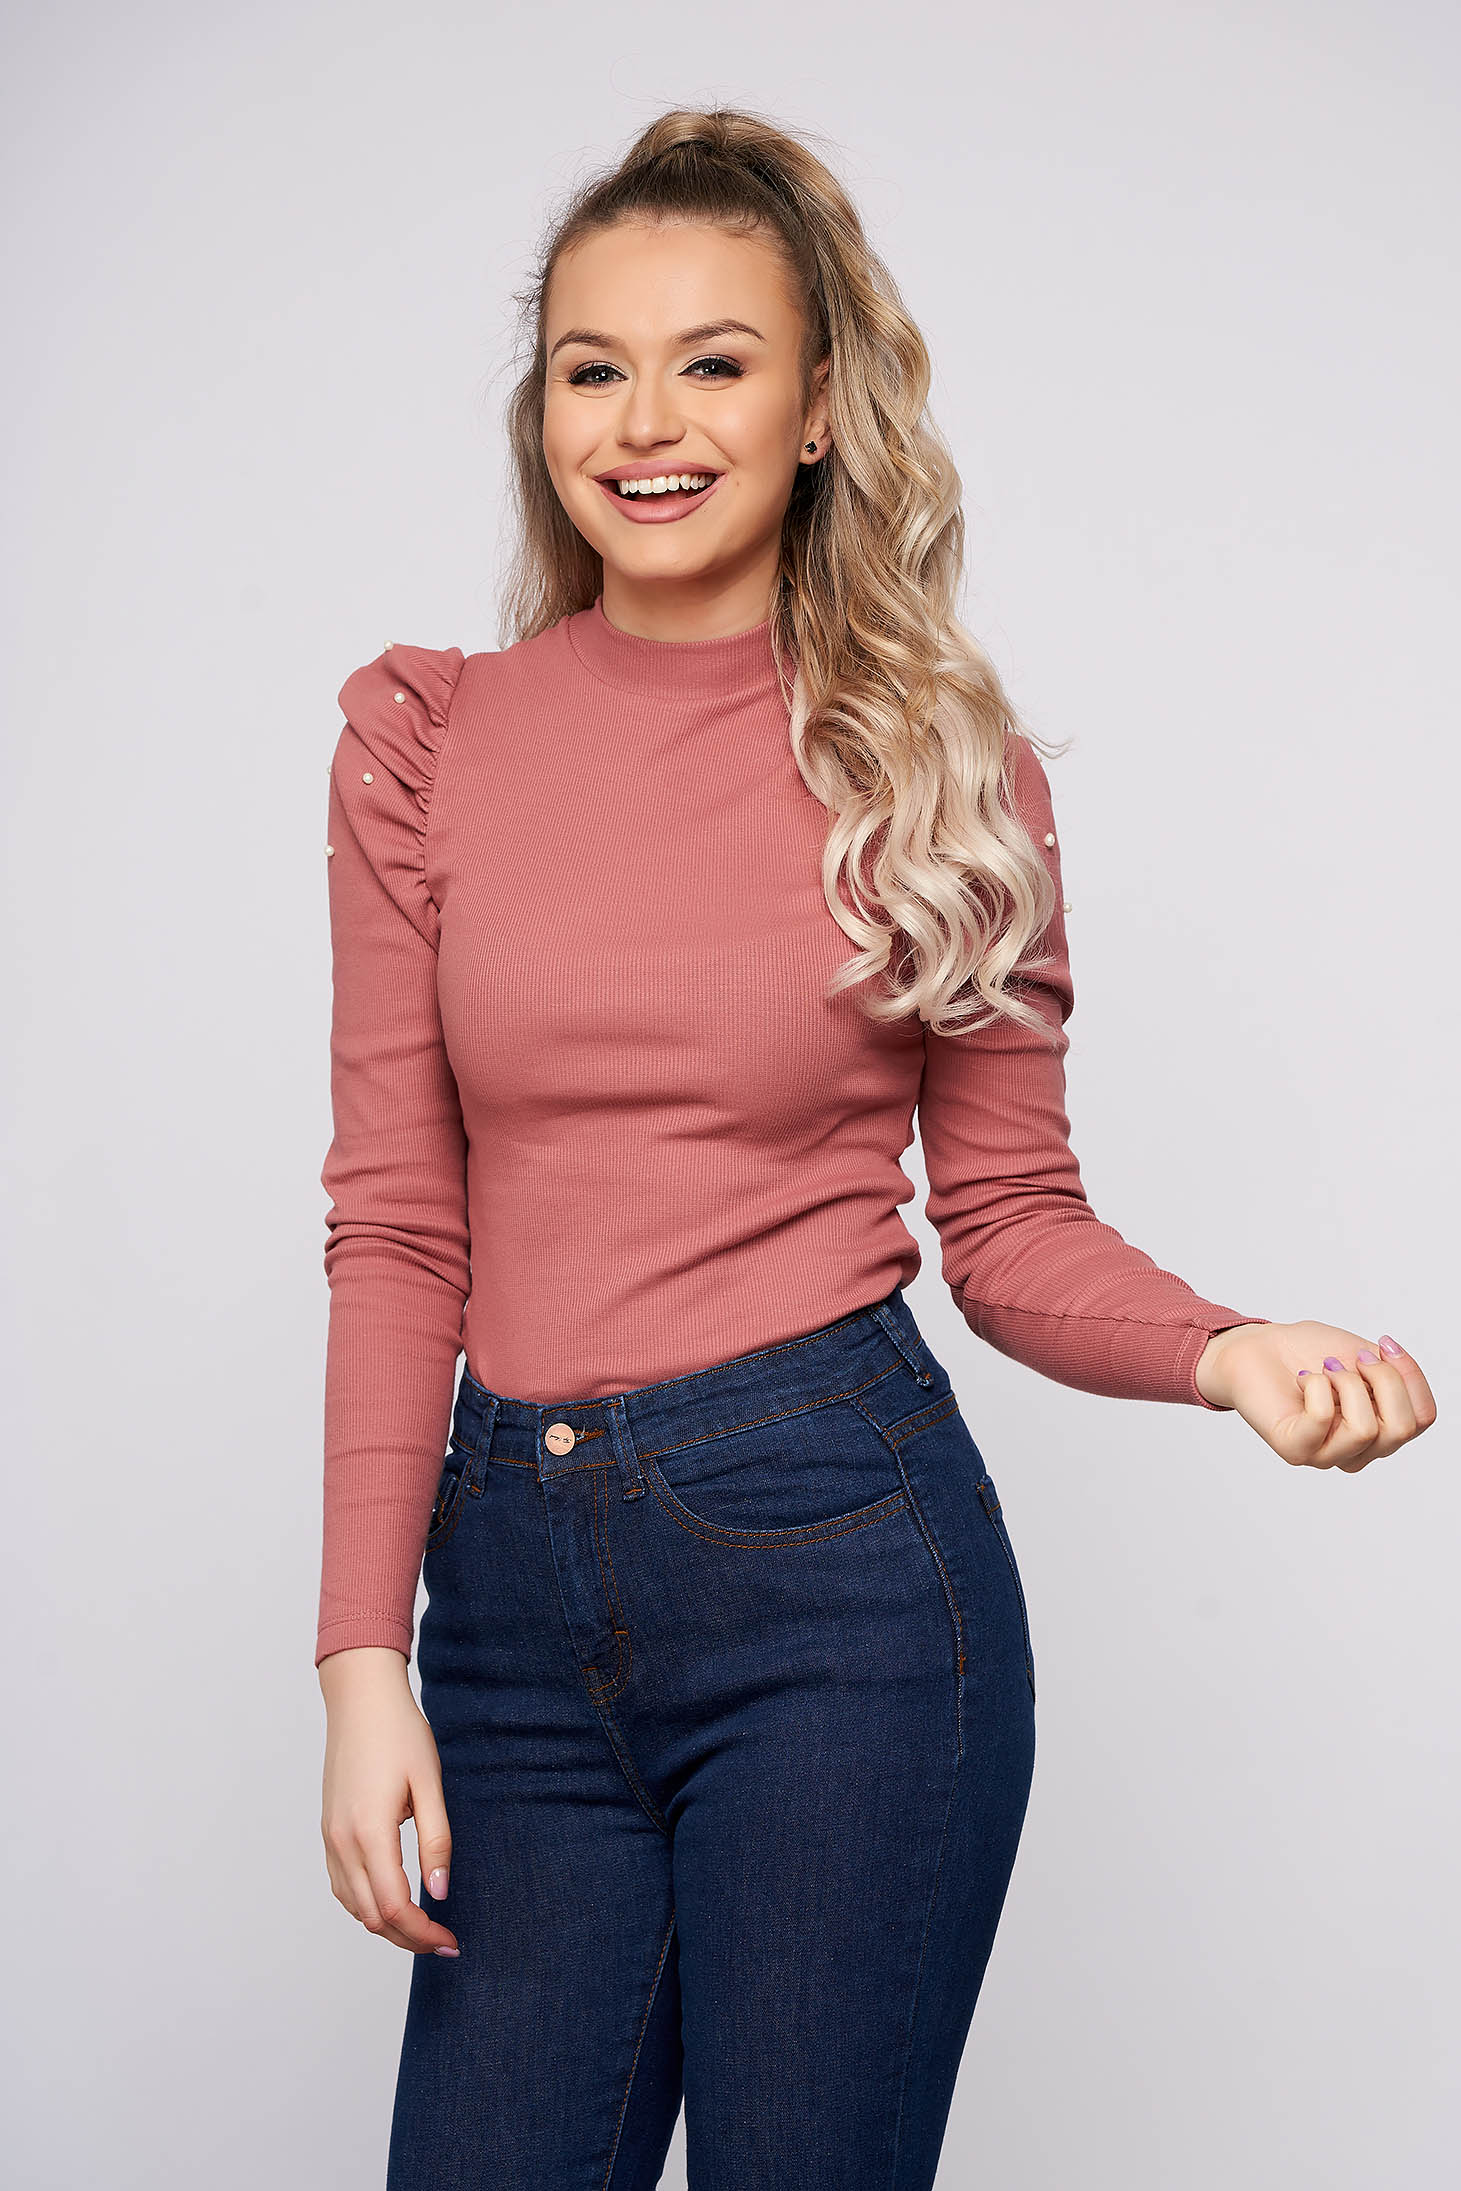 Lightpink elegant short cut cotton women`s blouse with turtle neck high shoulders tented